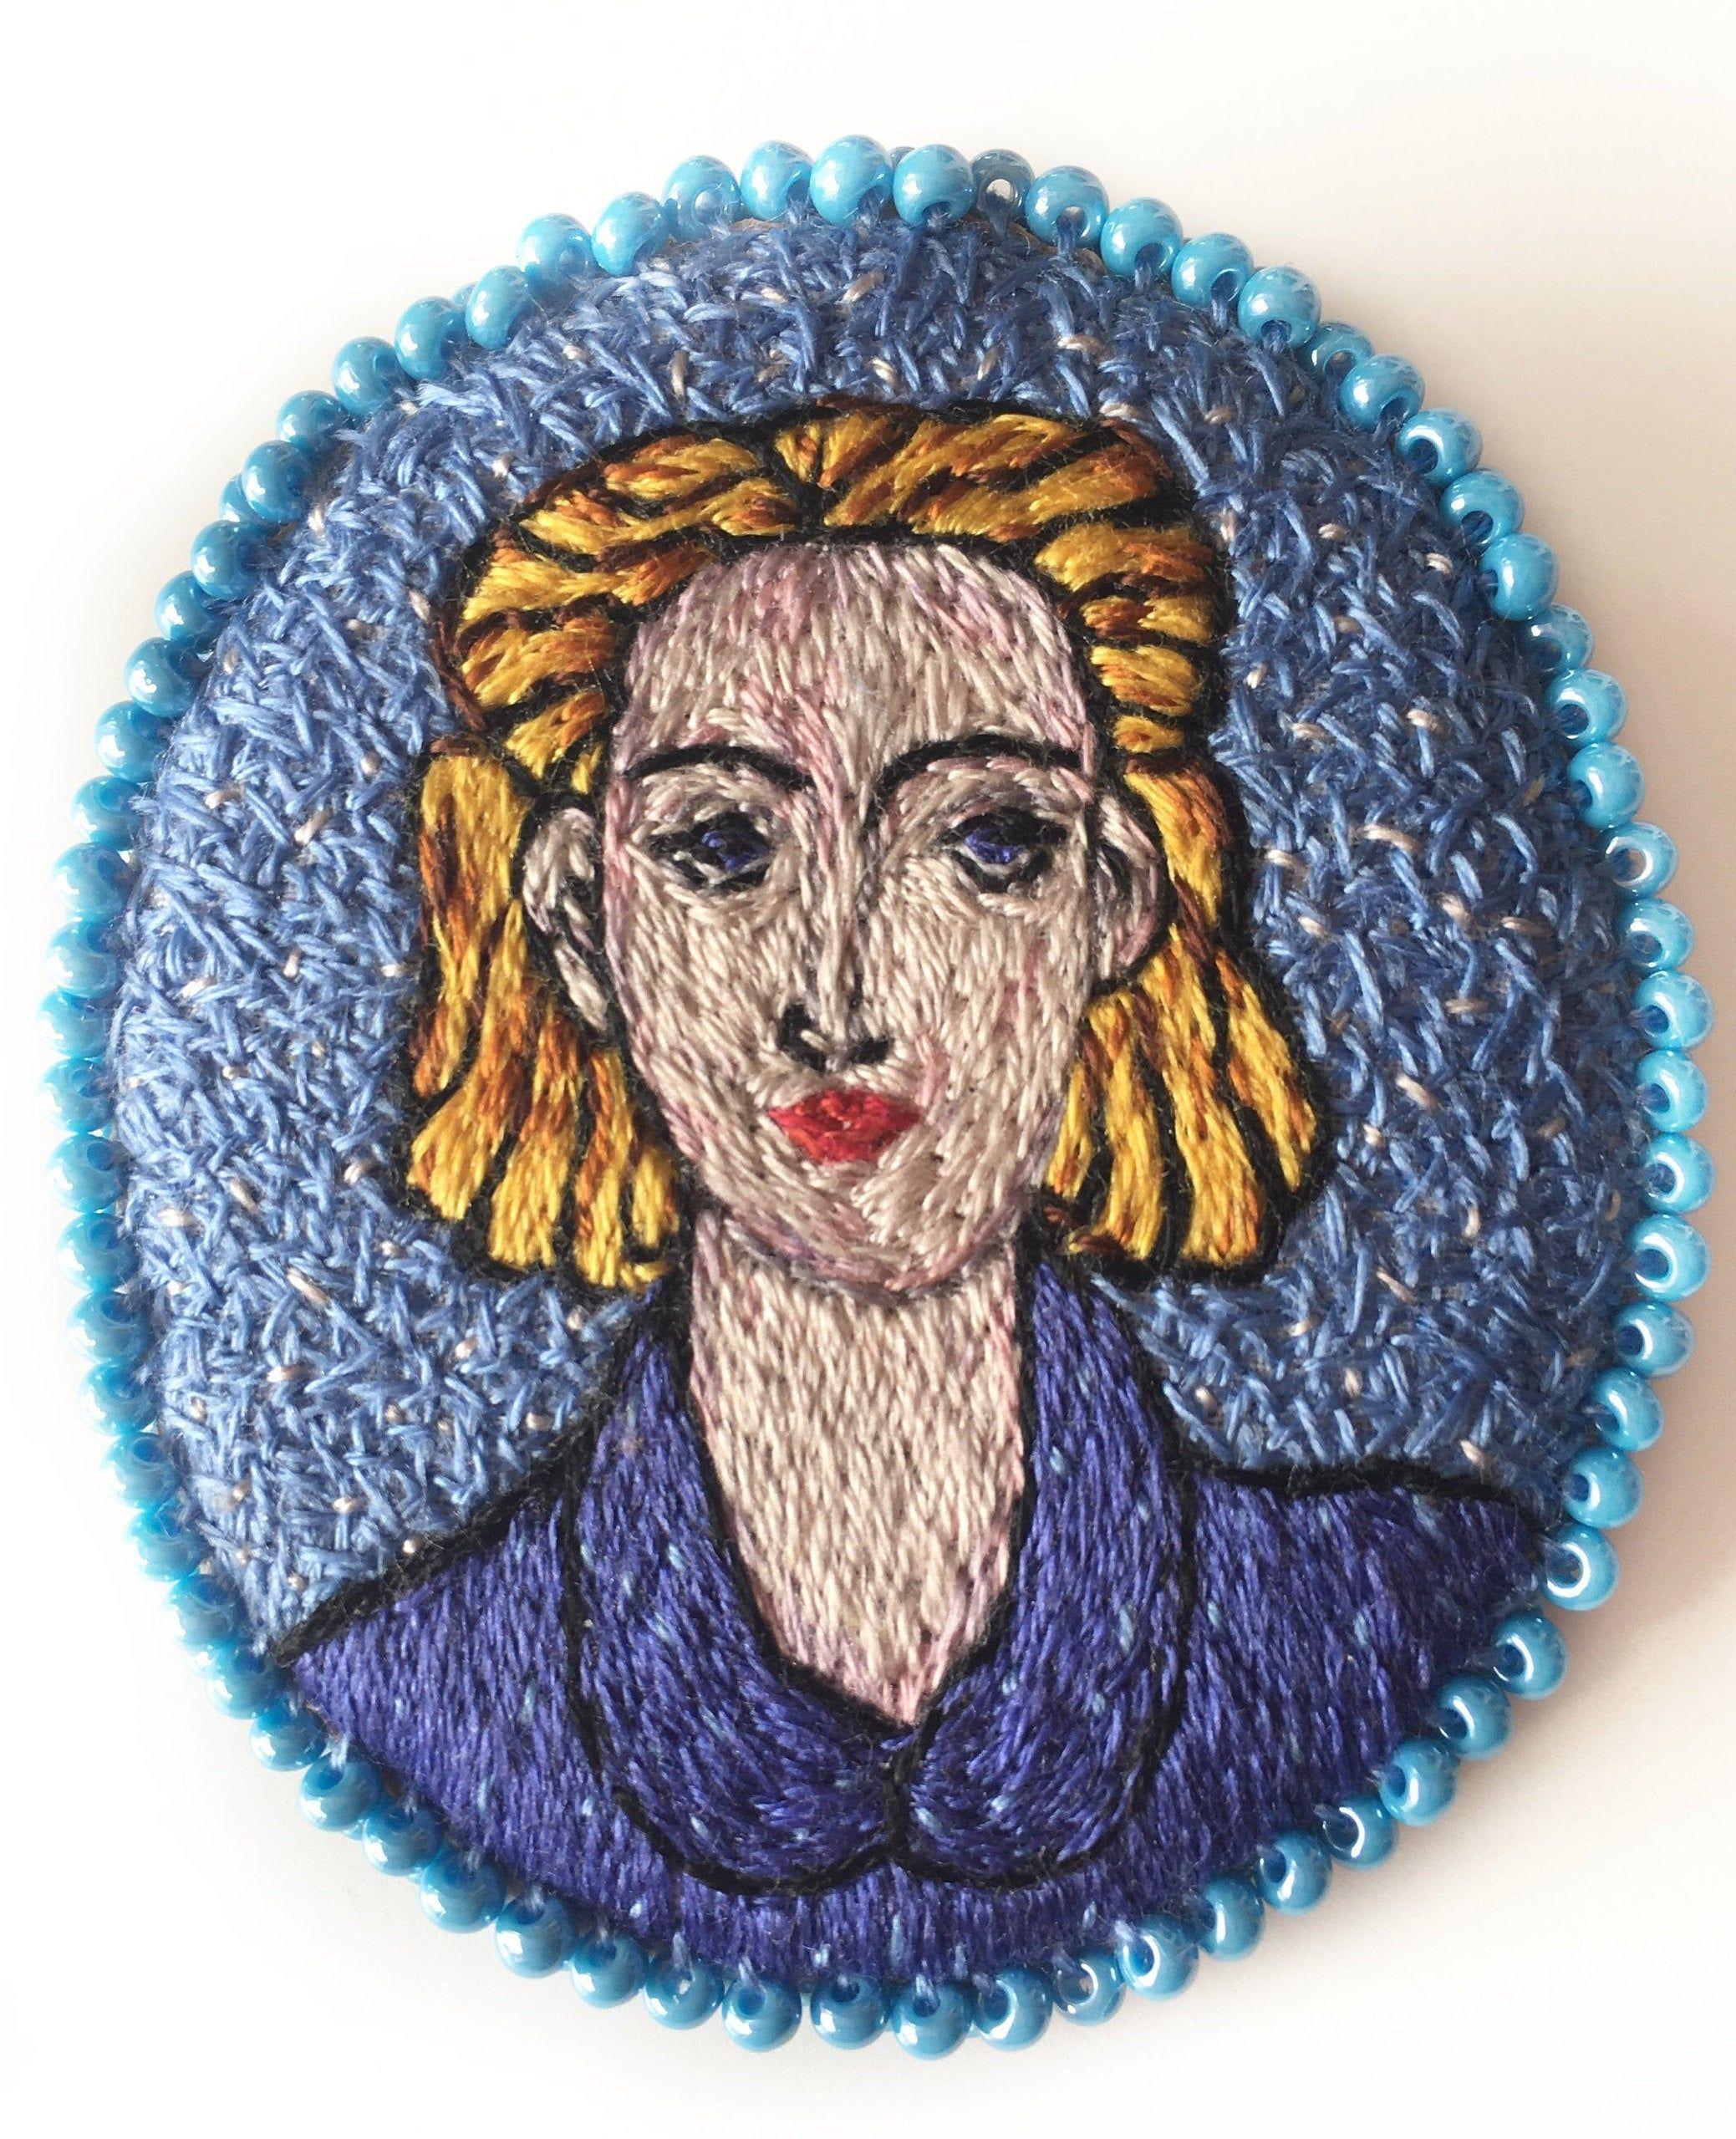 Art brooch Textile art jewelry Ernesto Che Guevara Embroidery portrait Embroidery brooch Che Guevara